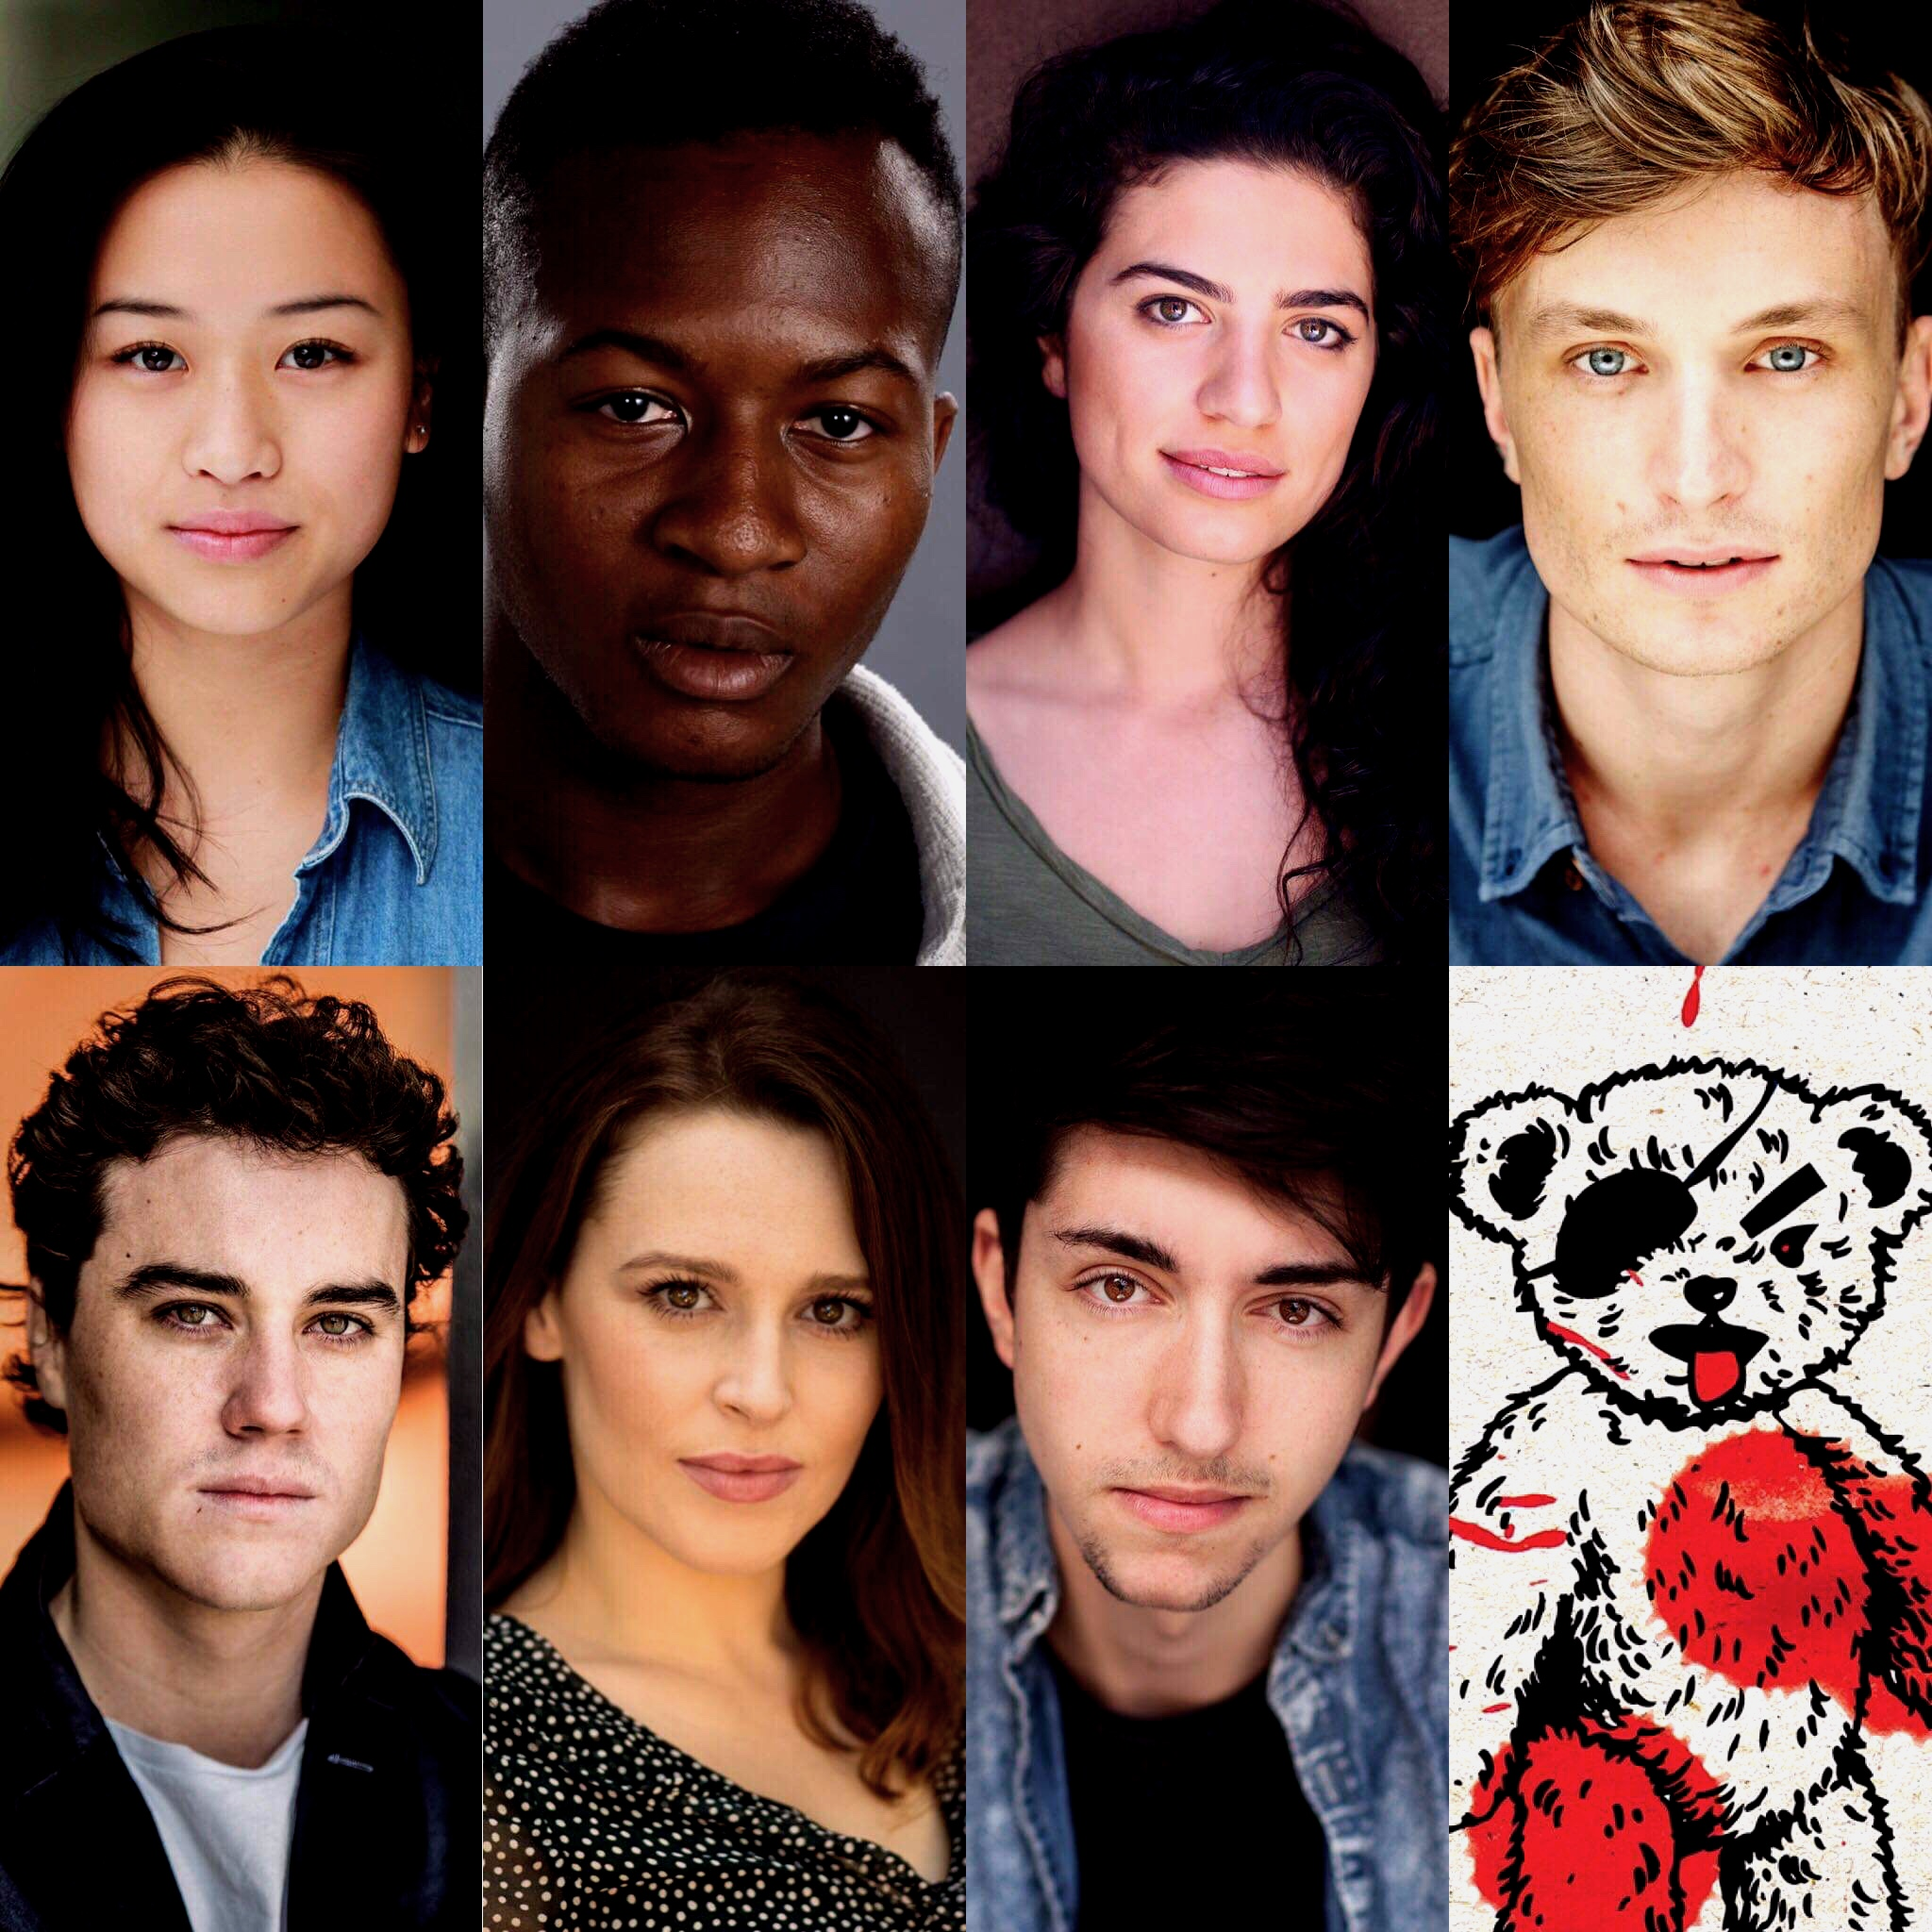 The ALICE IN SLASHERLAND cast: Stella Ye, Justin Amankwah, Mia Morrissey, Jack Angwin, Josh McElroy, Laura Murphy, Bardiya McKinnon & Edgar.